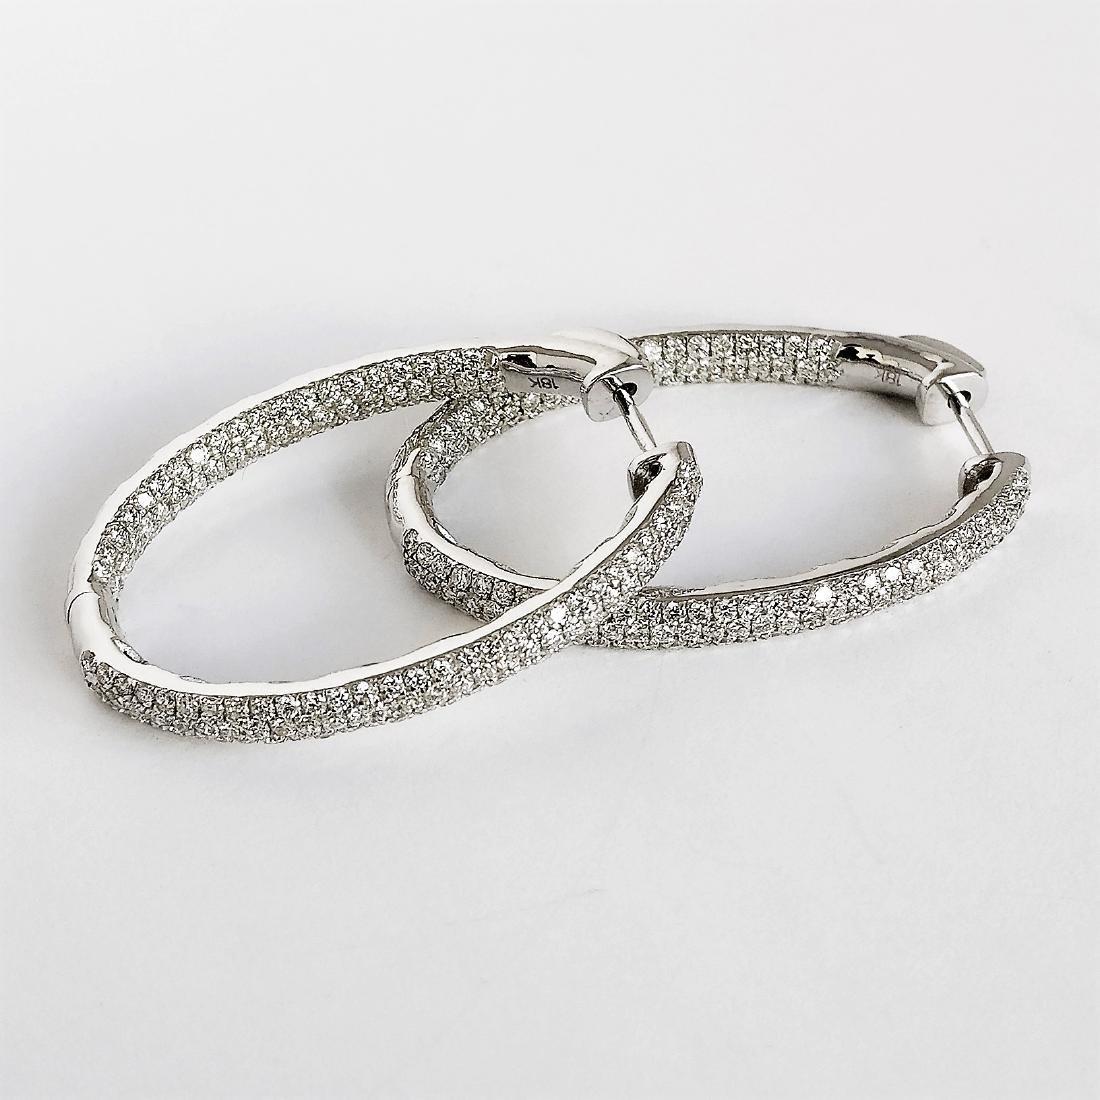 Ladies Earrings with Diamonds total 5.84 ct - 3